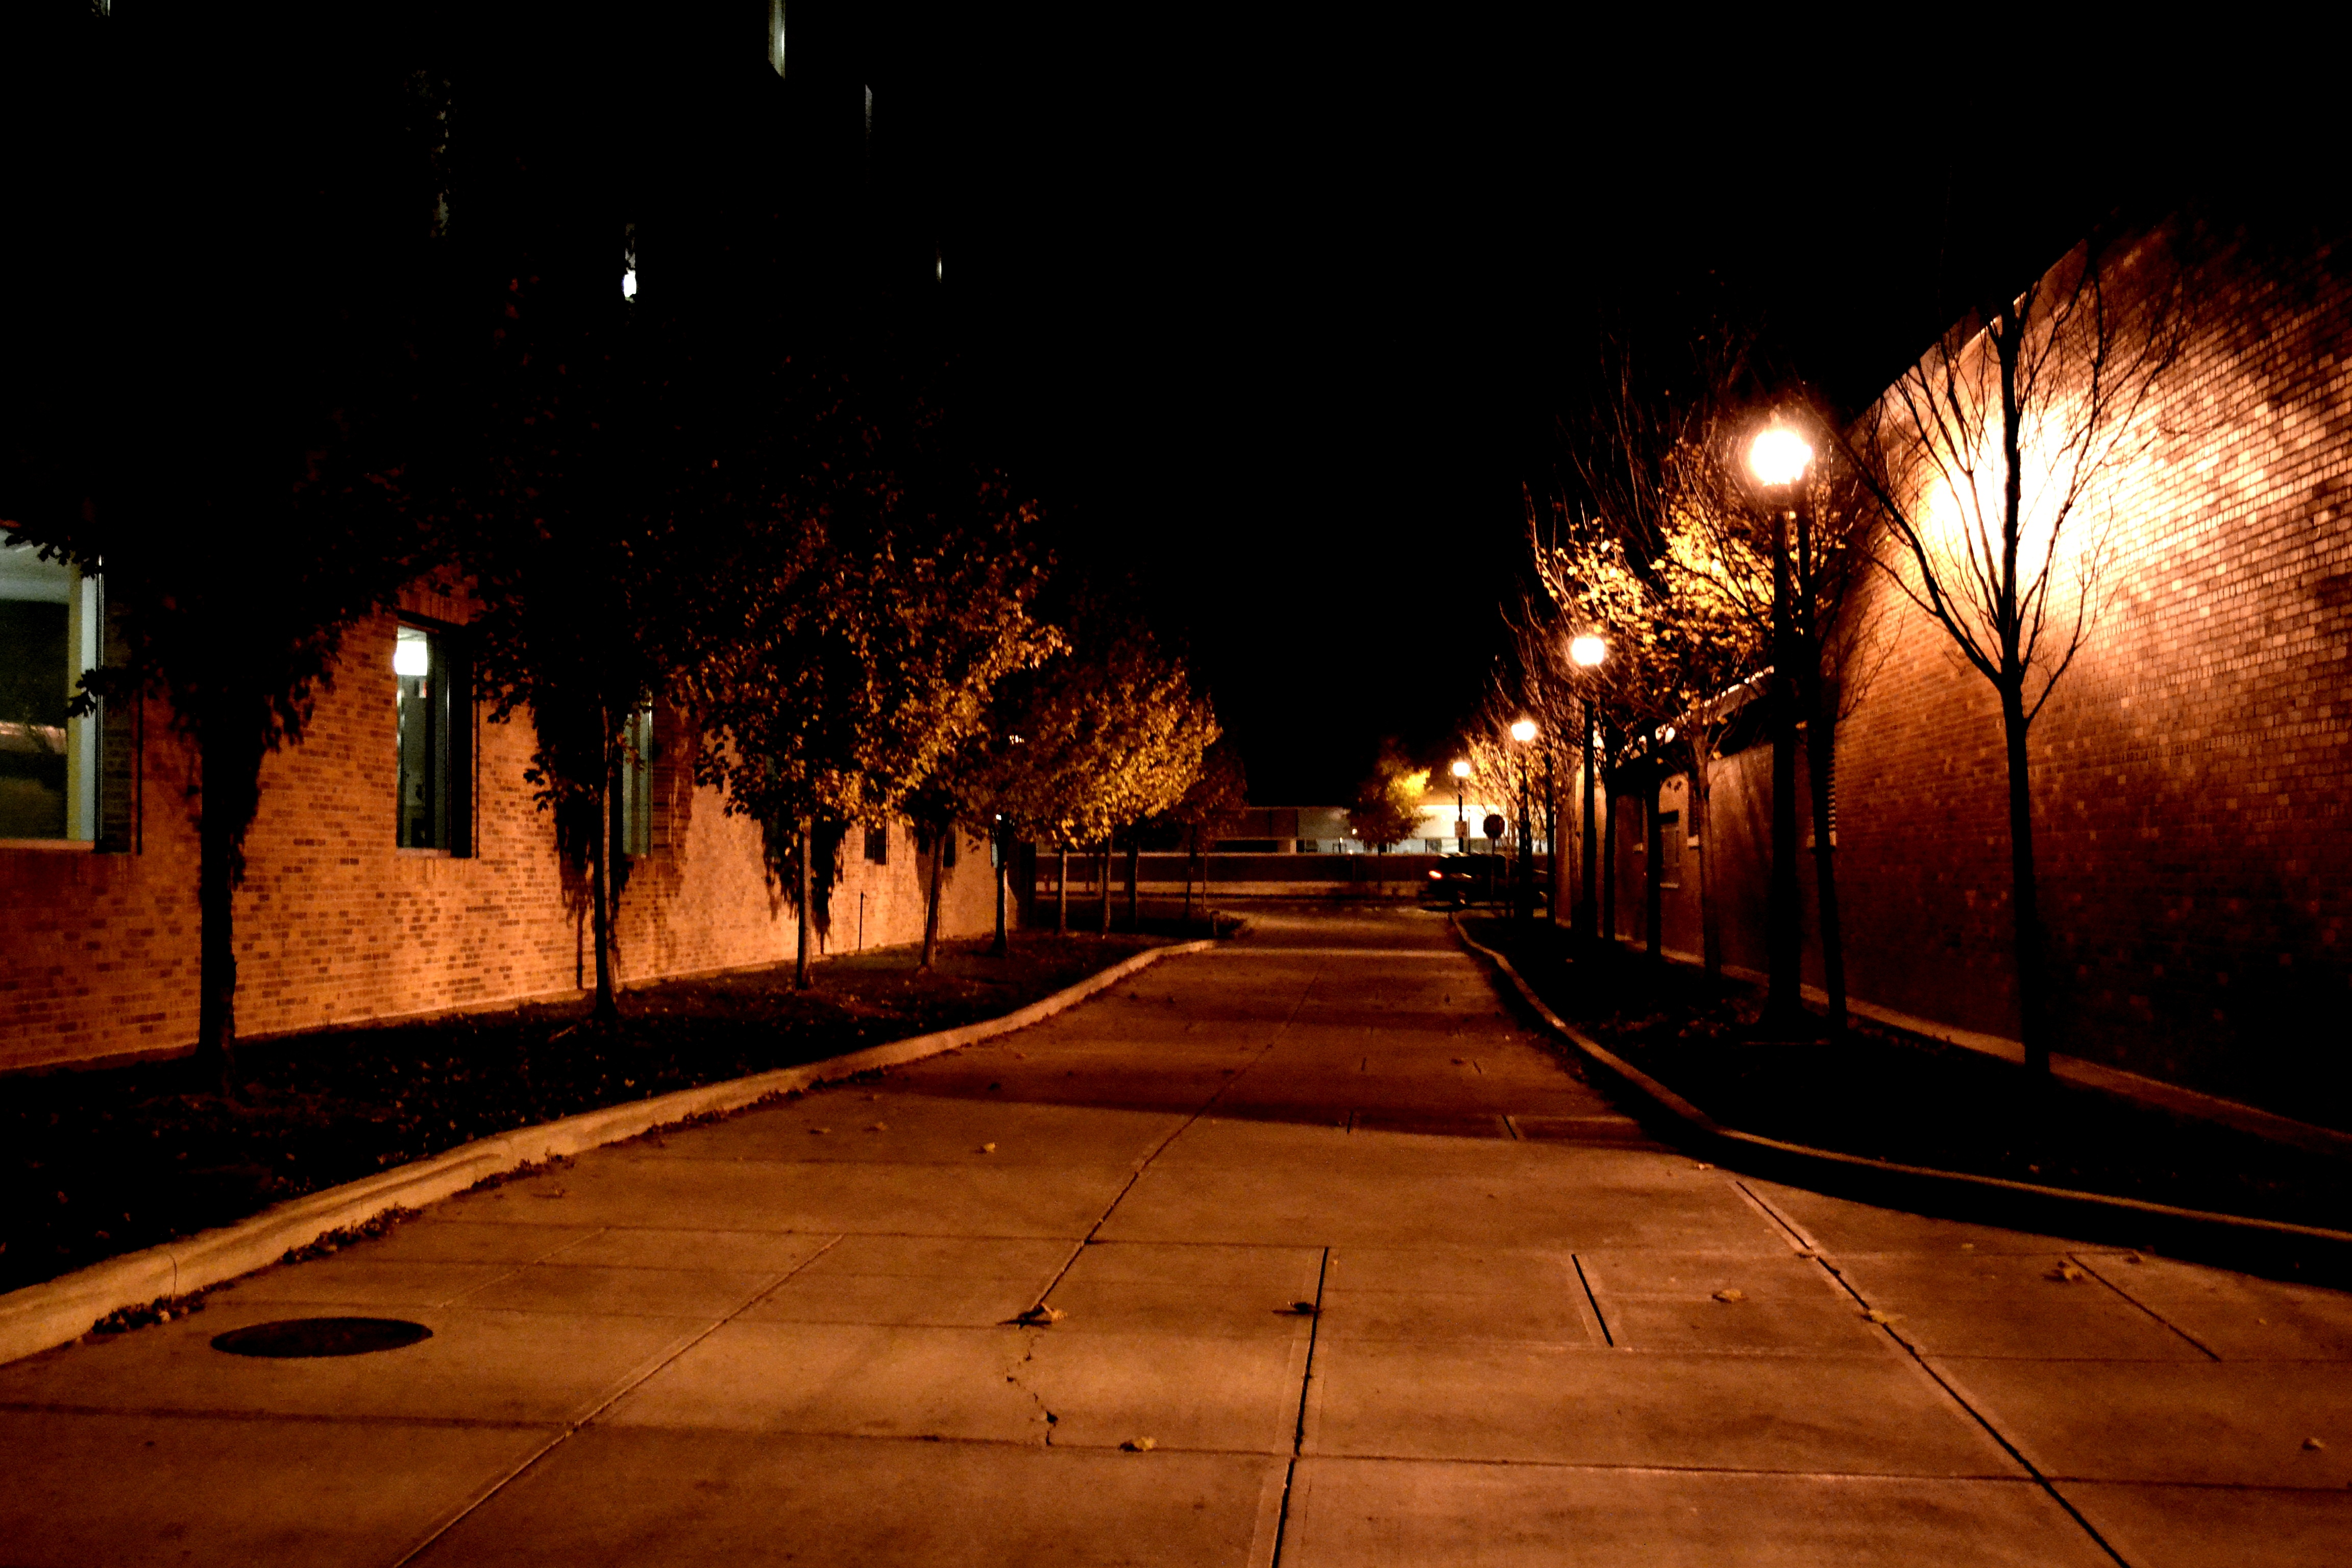 University alley fonds d 39 cran arri res plan 4608x3072 for Fond ecran uni